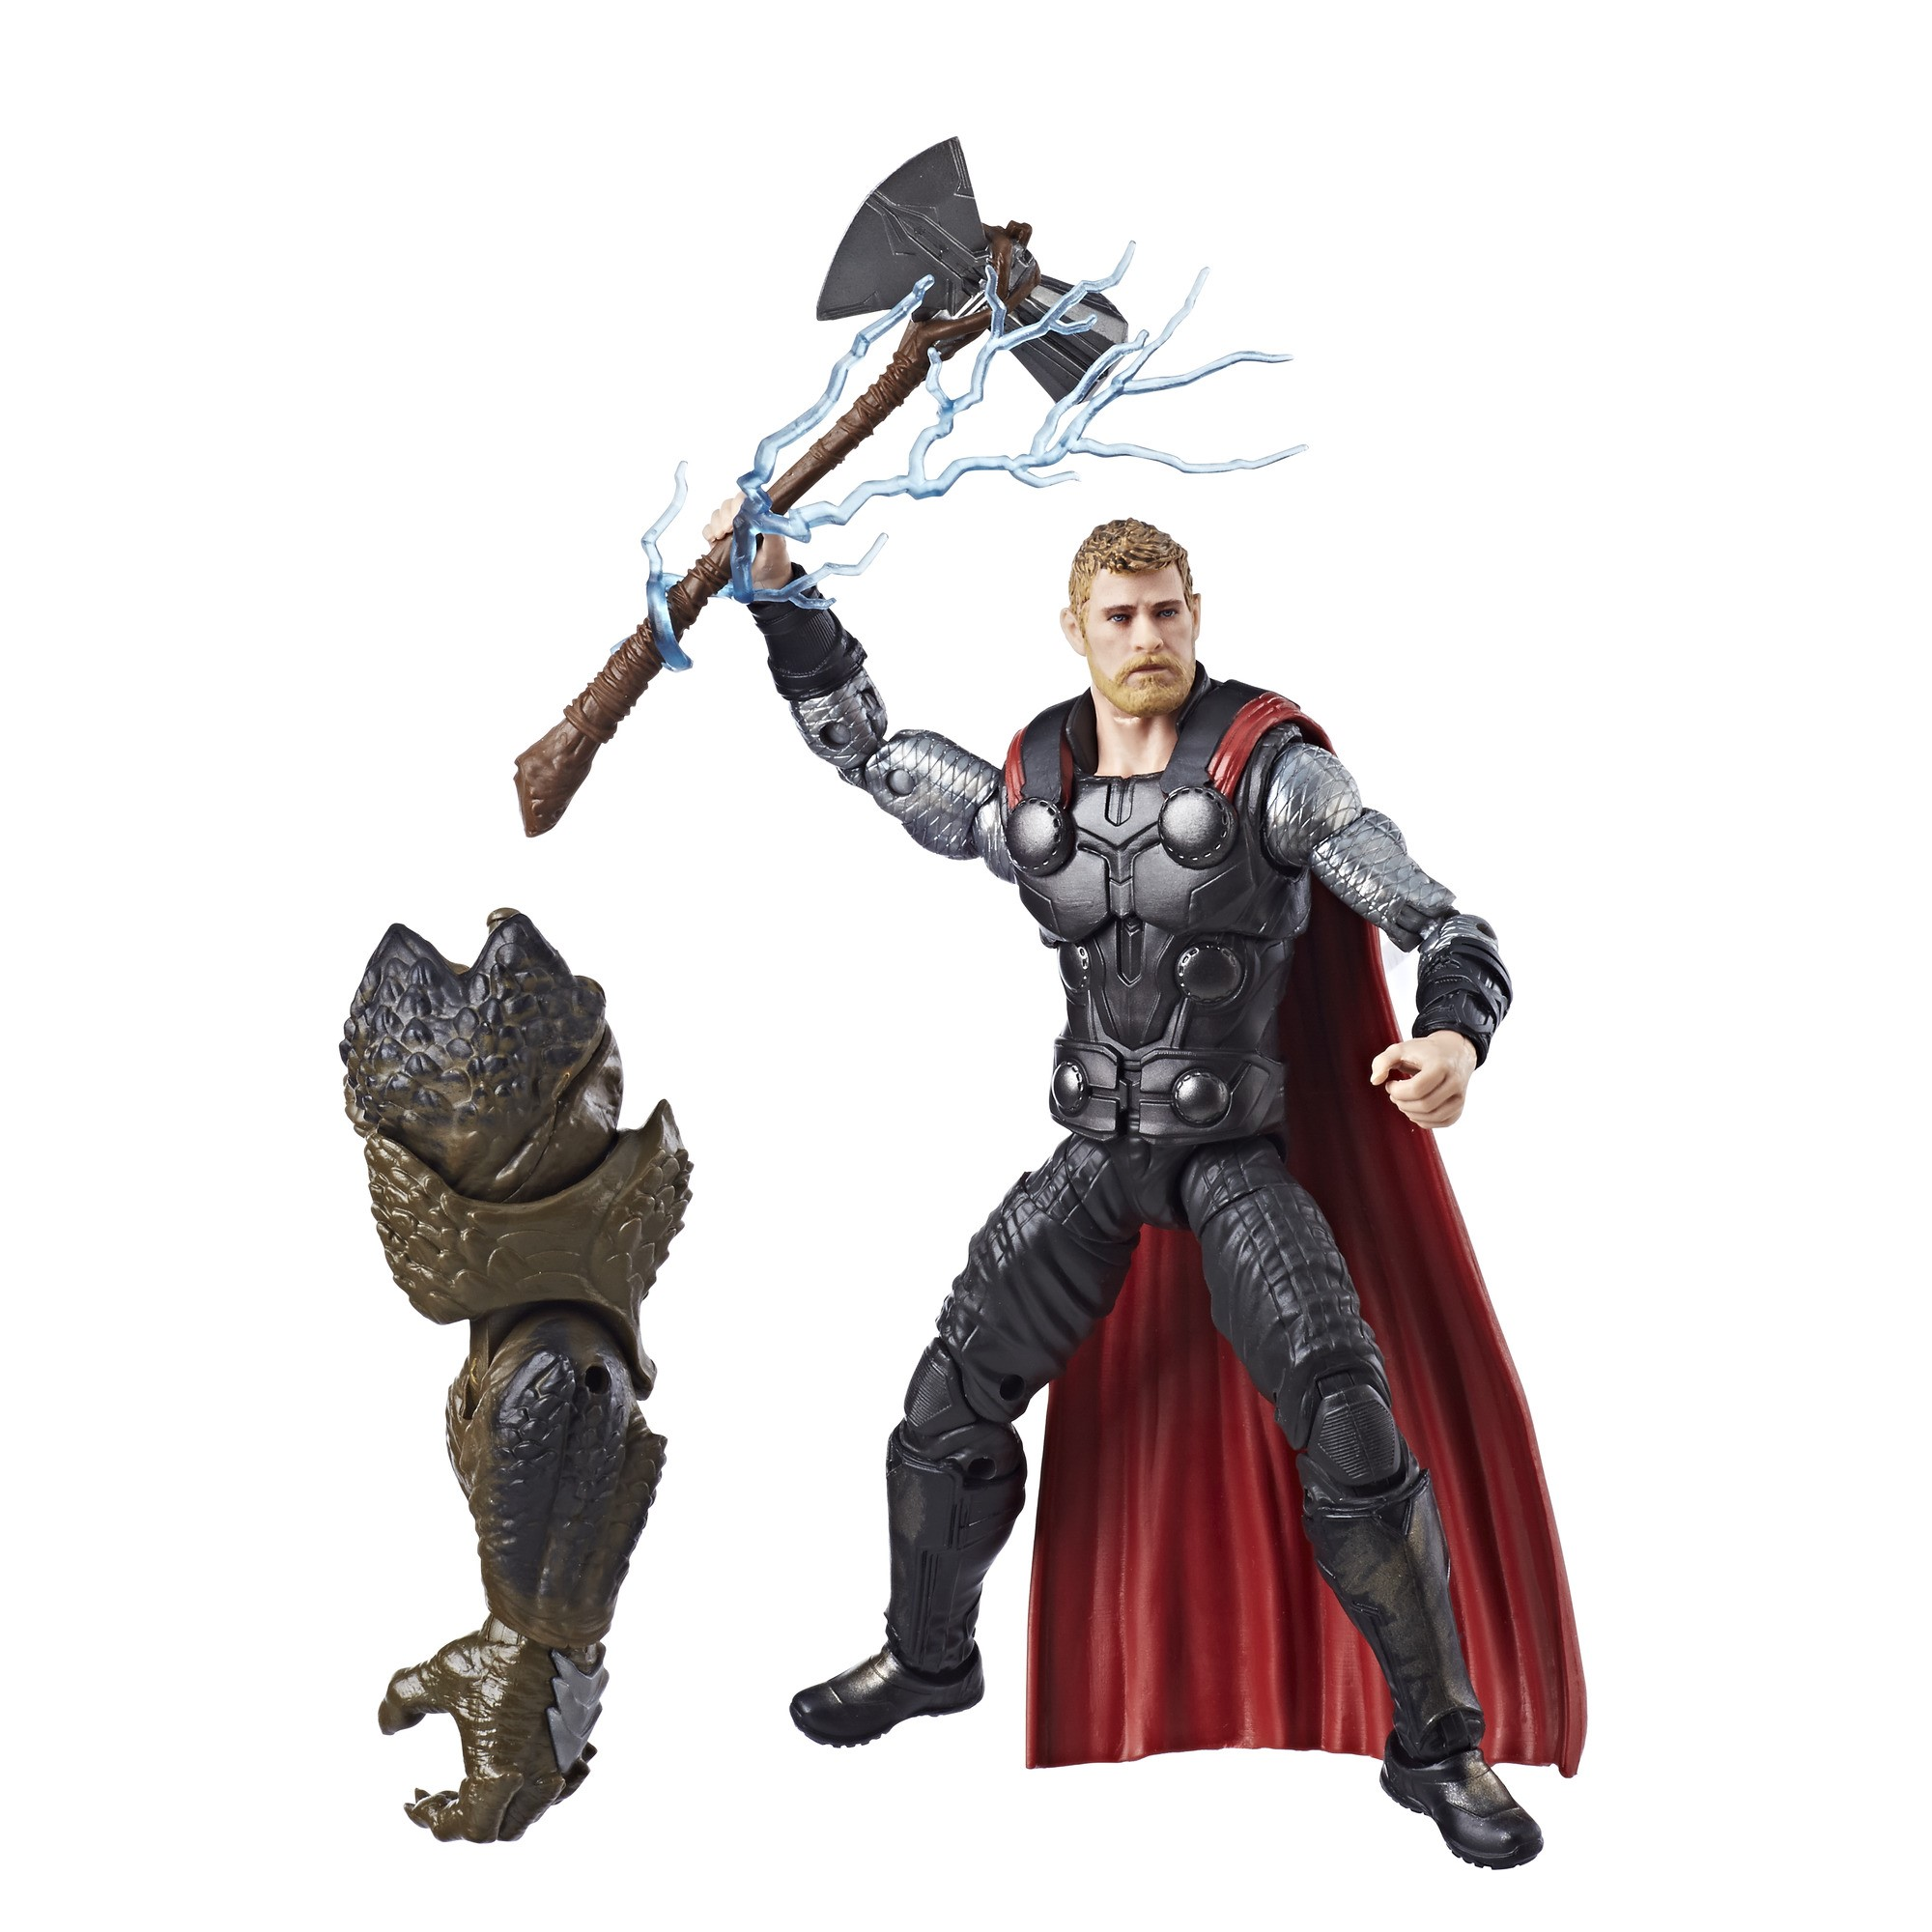 Buy Avengers Marvel Legends Series 6 Inch Thor Action Figure Online In Ghana 534660390